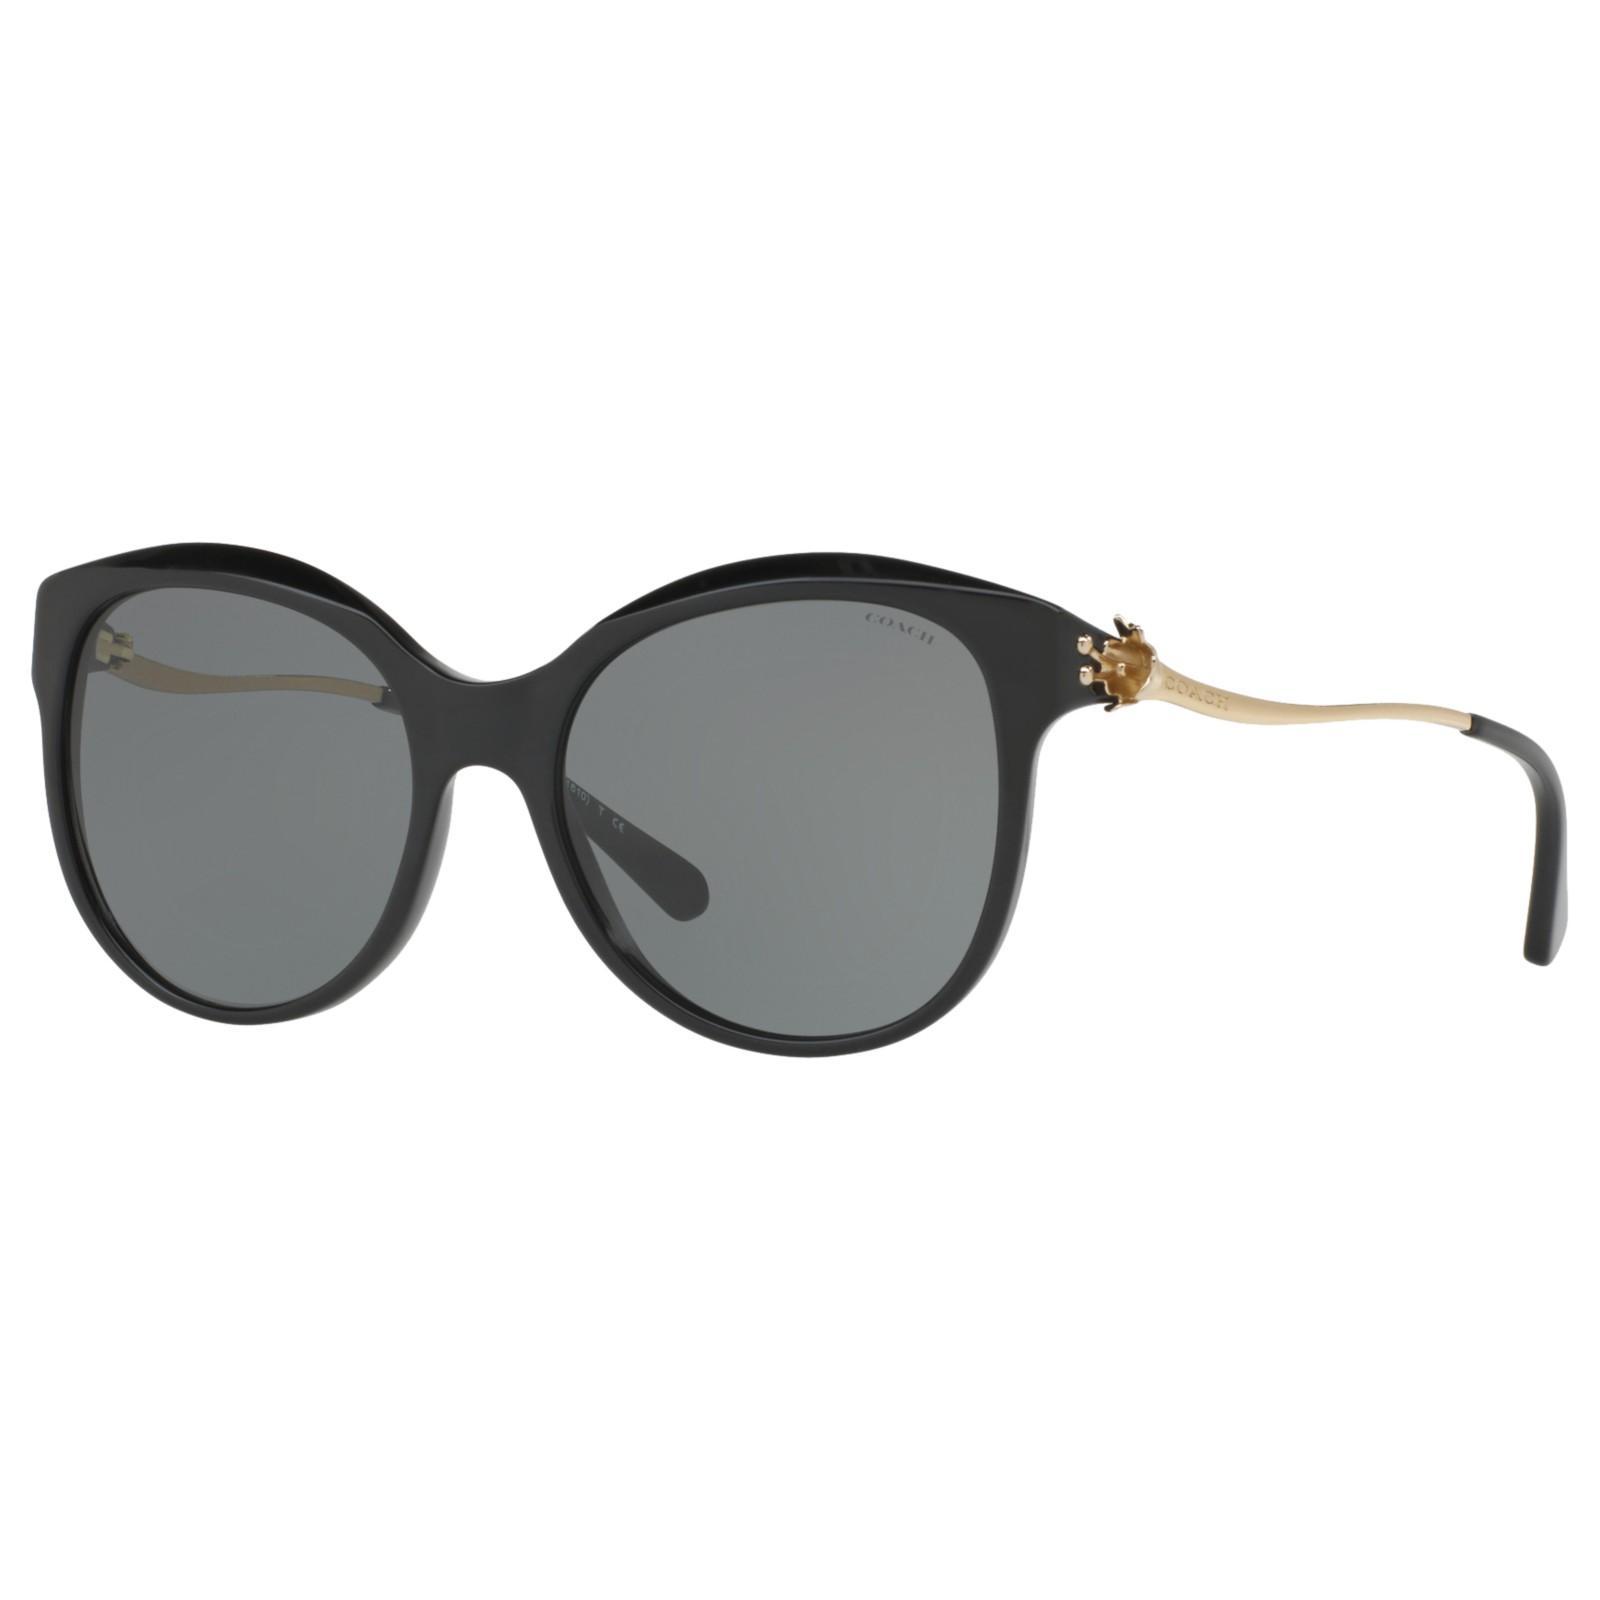 113cdf07b4 Coach Hc8189 Oval Sunglasses in Gray - Lyst